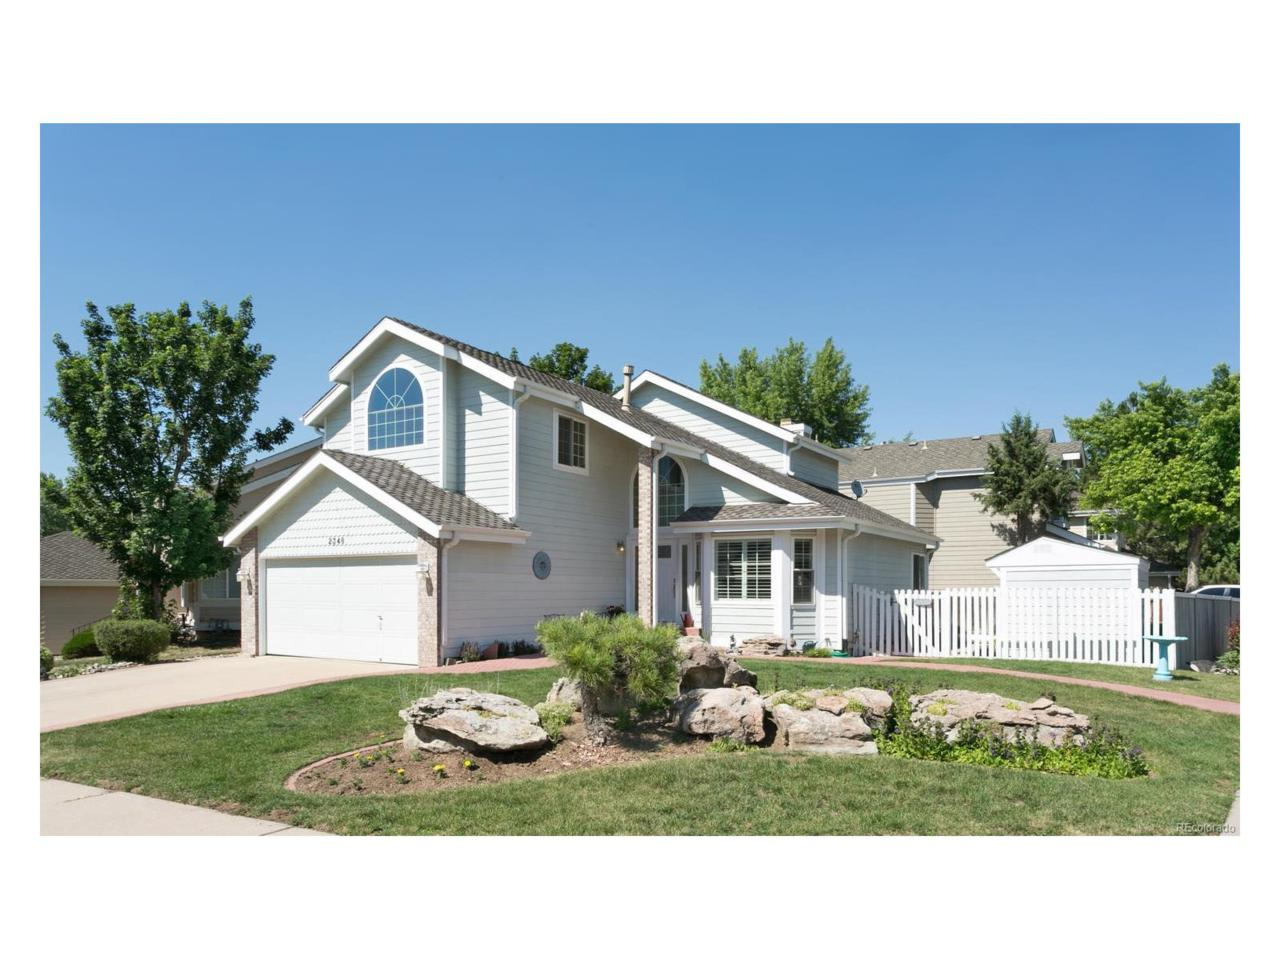 2348 S Gray Street, Lakewood, CO 80227 (MLS #7282987) :: 8z Real Estate